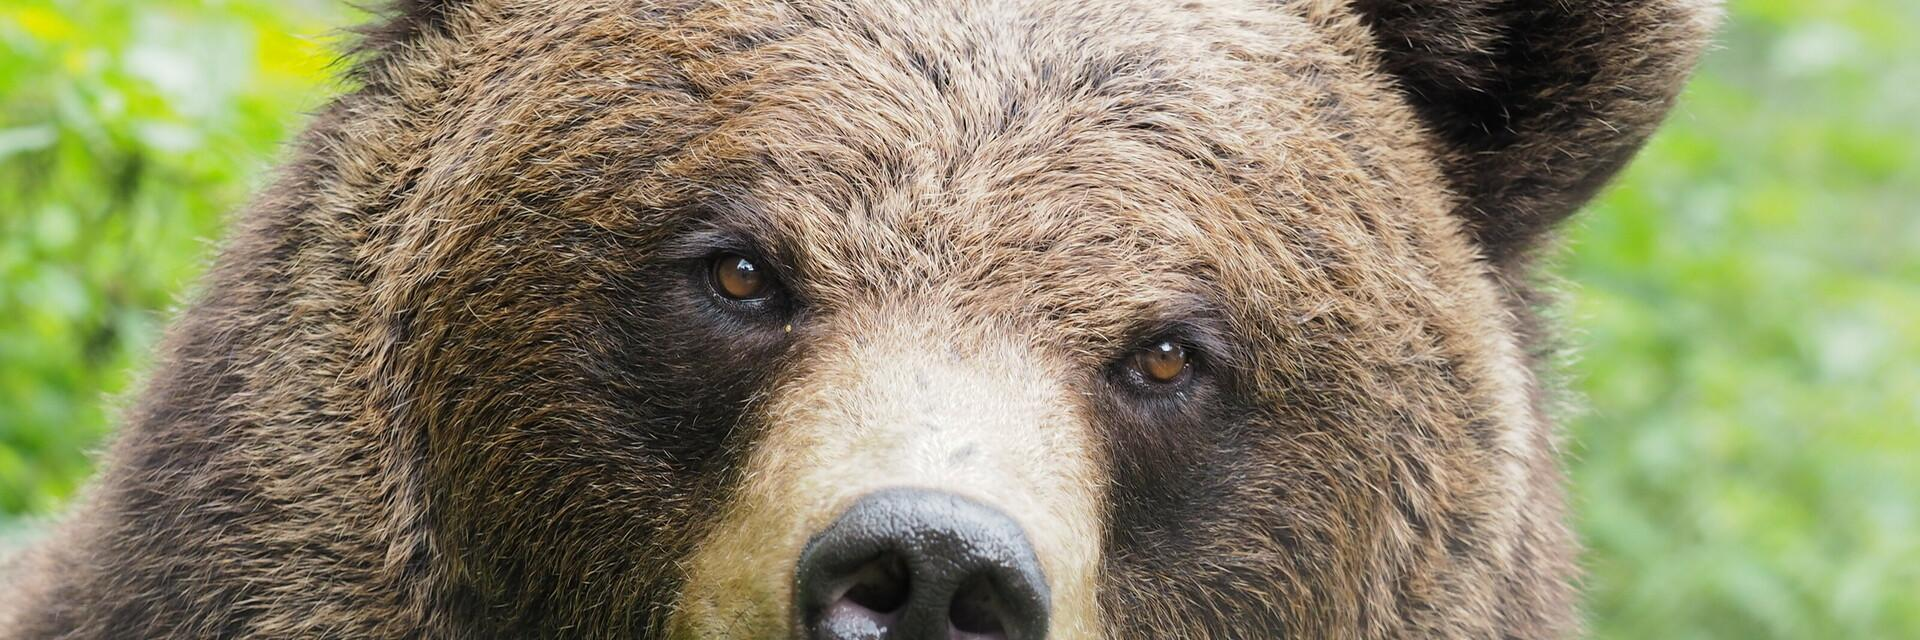 Bear Emma